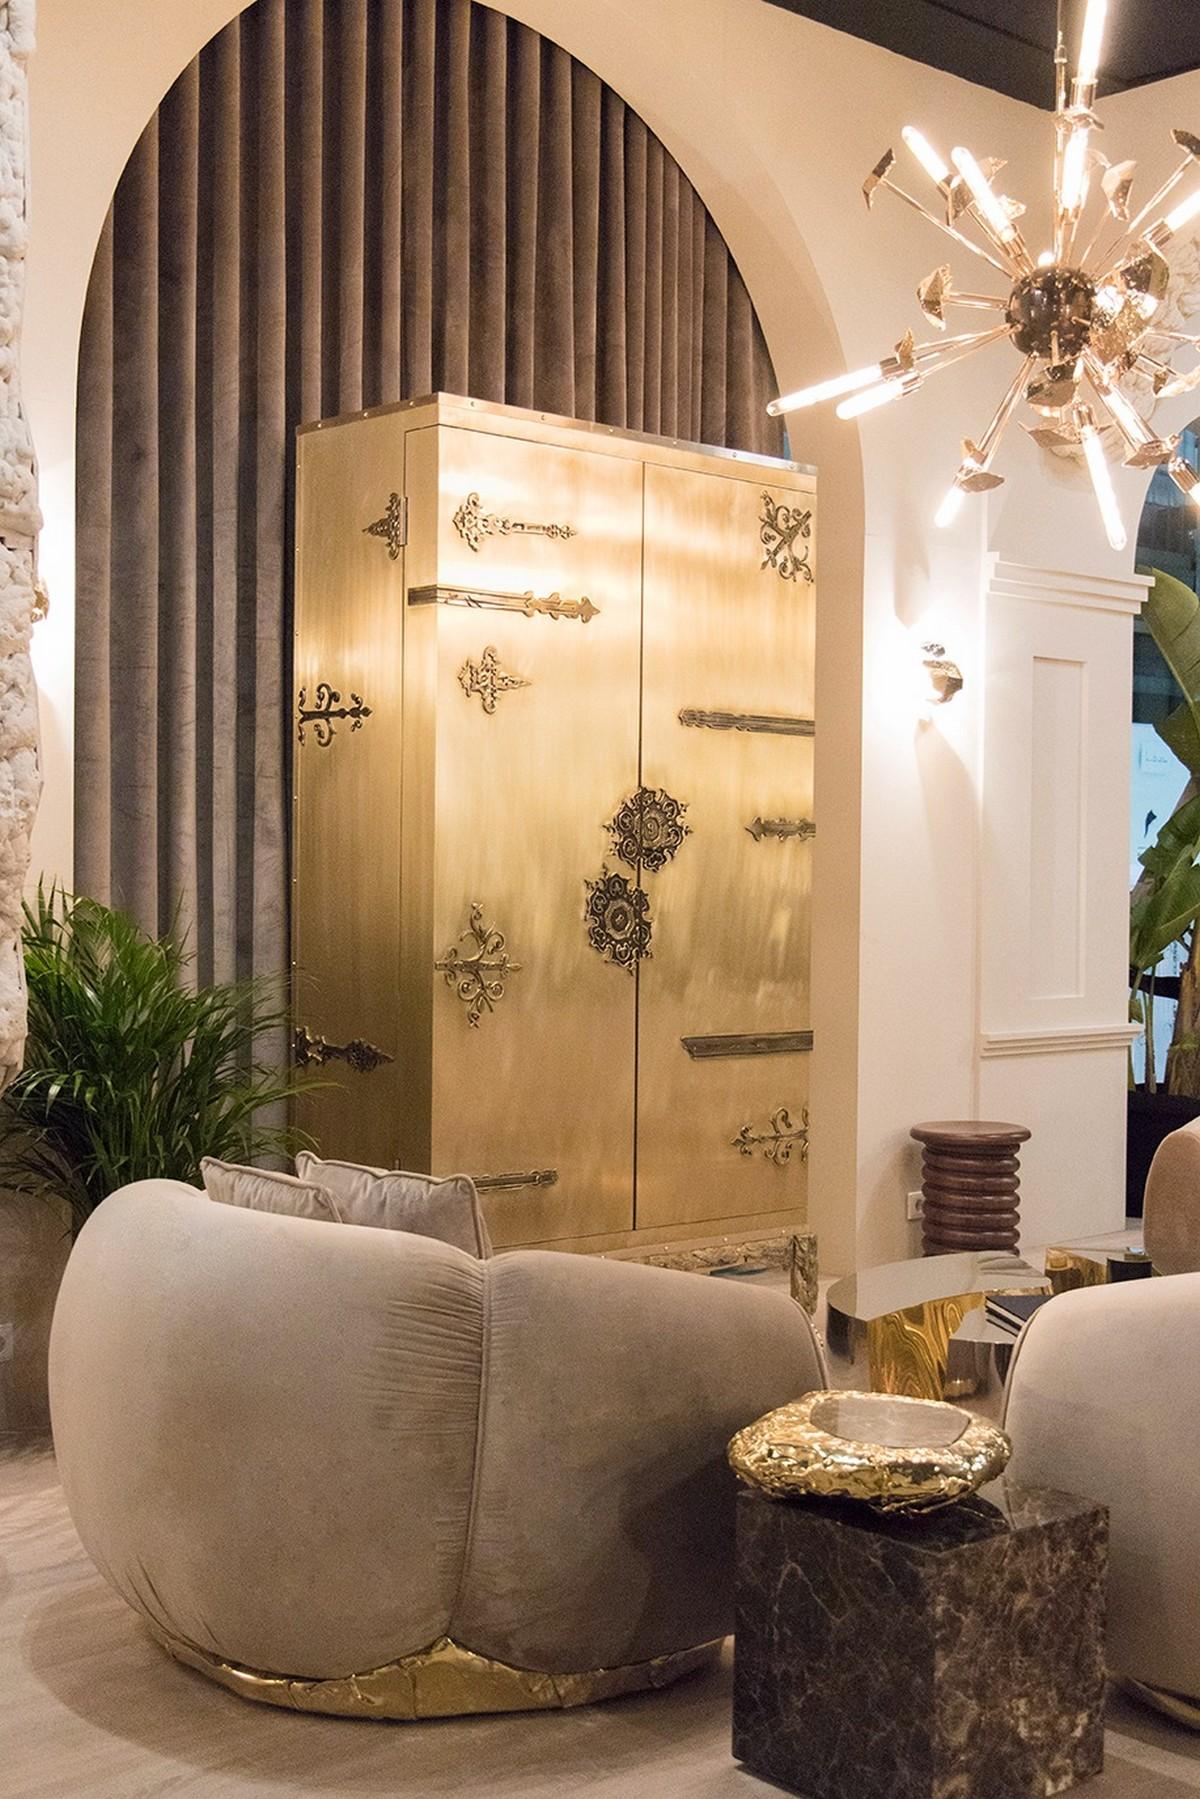 Maison et Objet: New Dining Room Designs maison et objet Maison et Objet: New Dining Room Designs savage